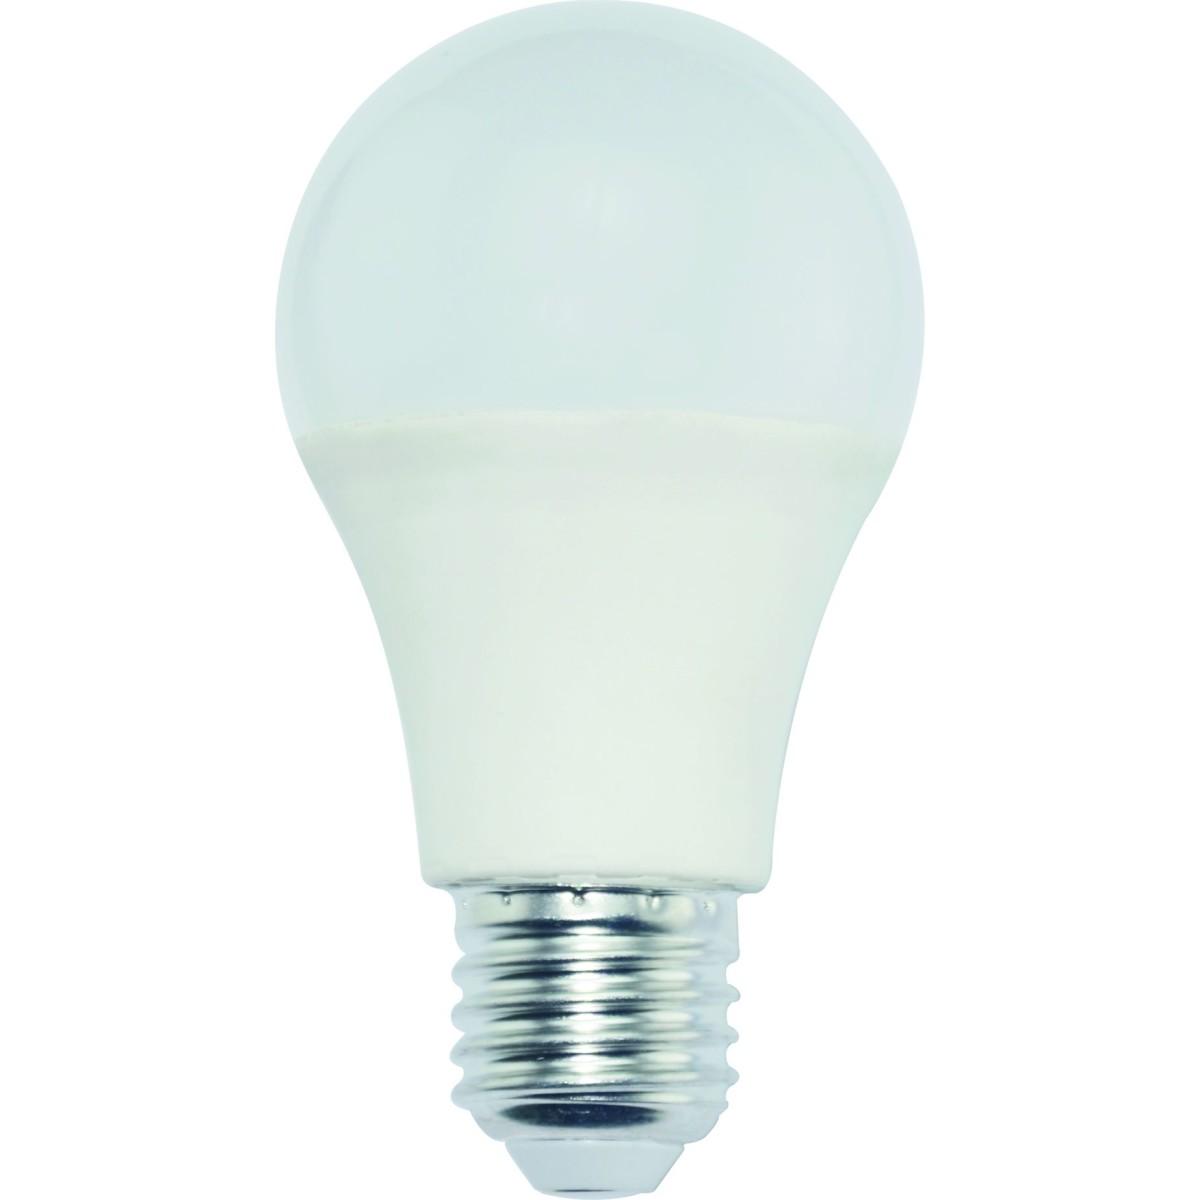 Лампа Ecola light E27 12 Вт груша 960 Лм теплый 4 шт